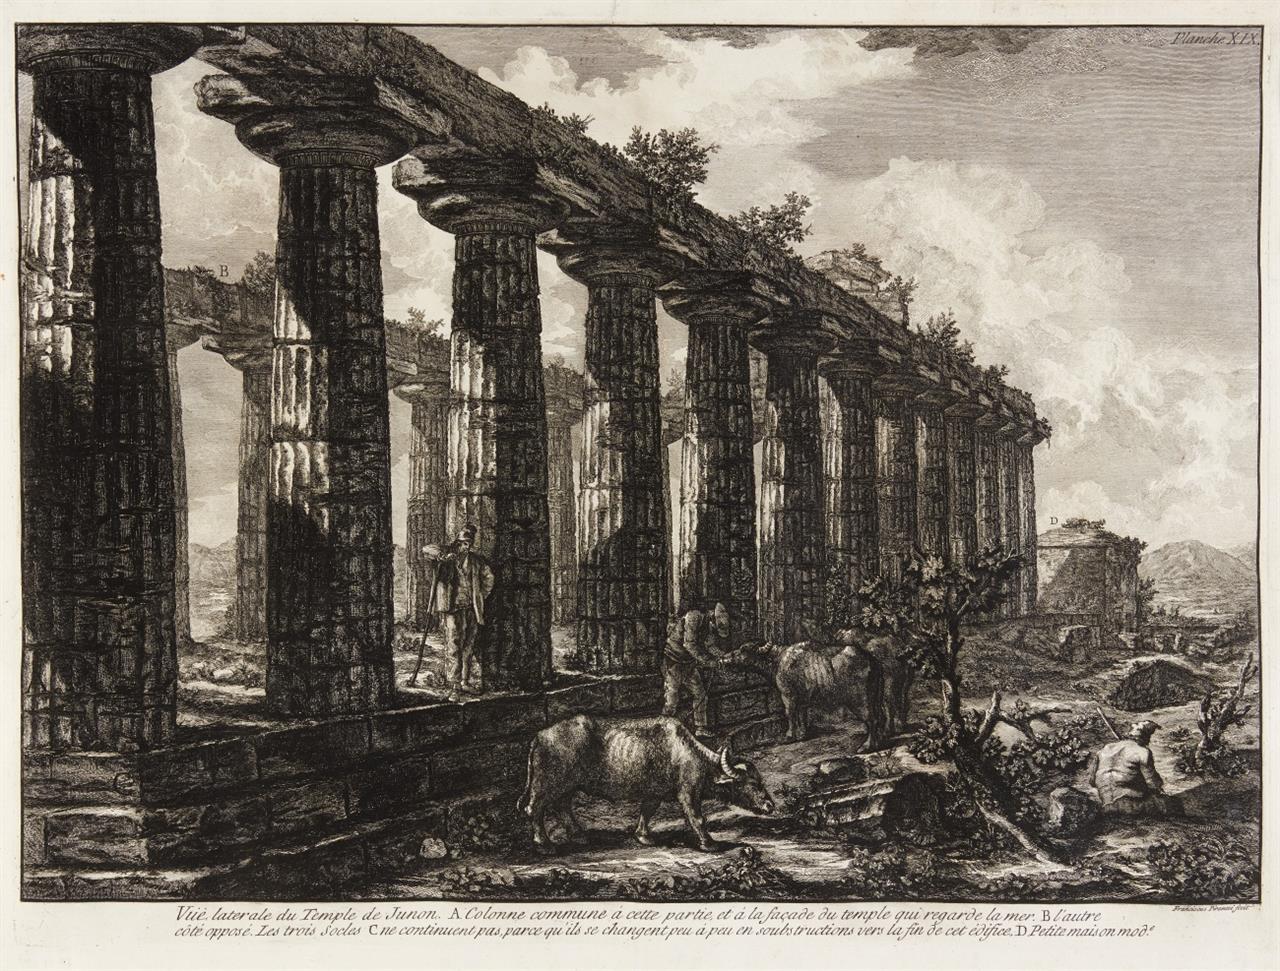 G.B. Piranesi. Vue laterale du Temple de Junon. 1778. Radierung. W.-E. 736.